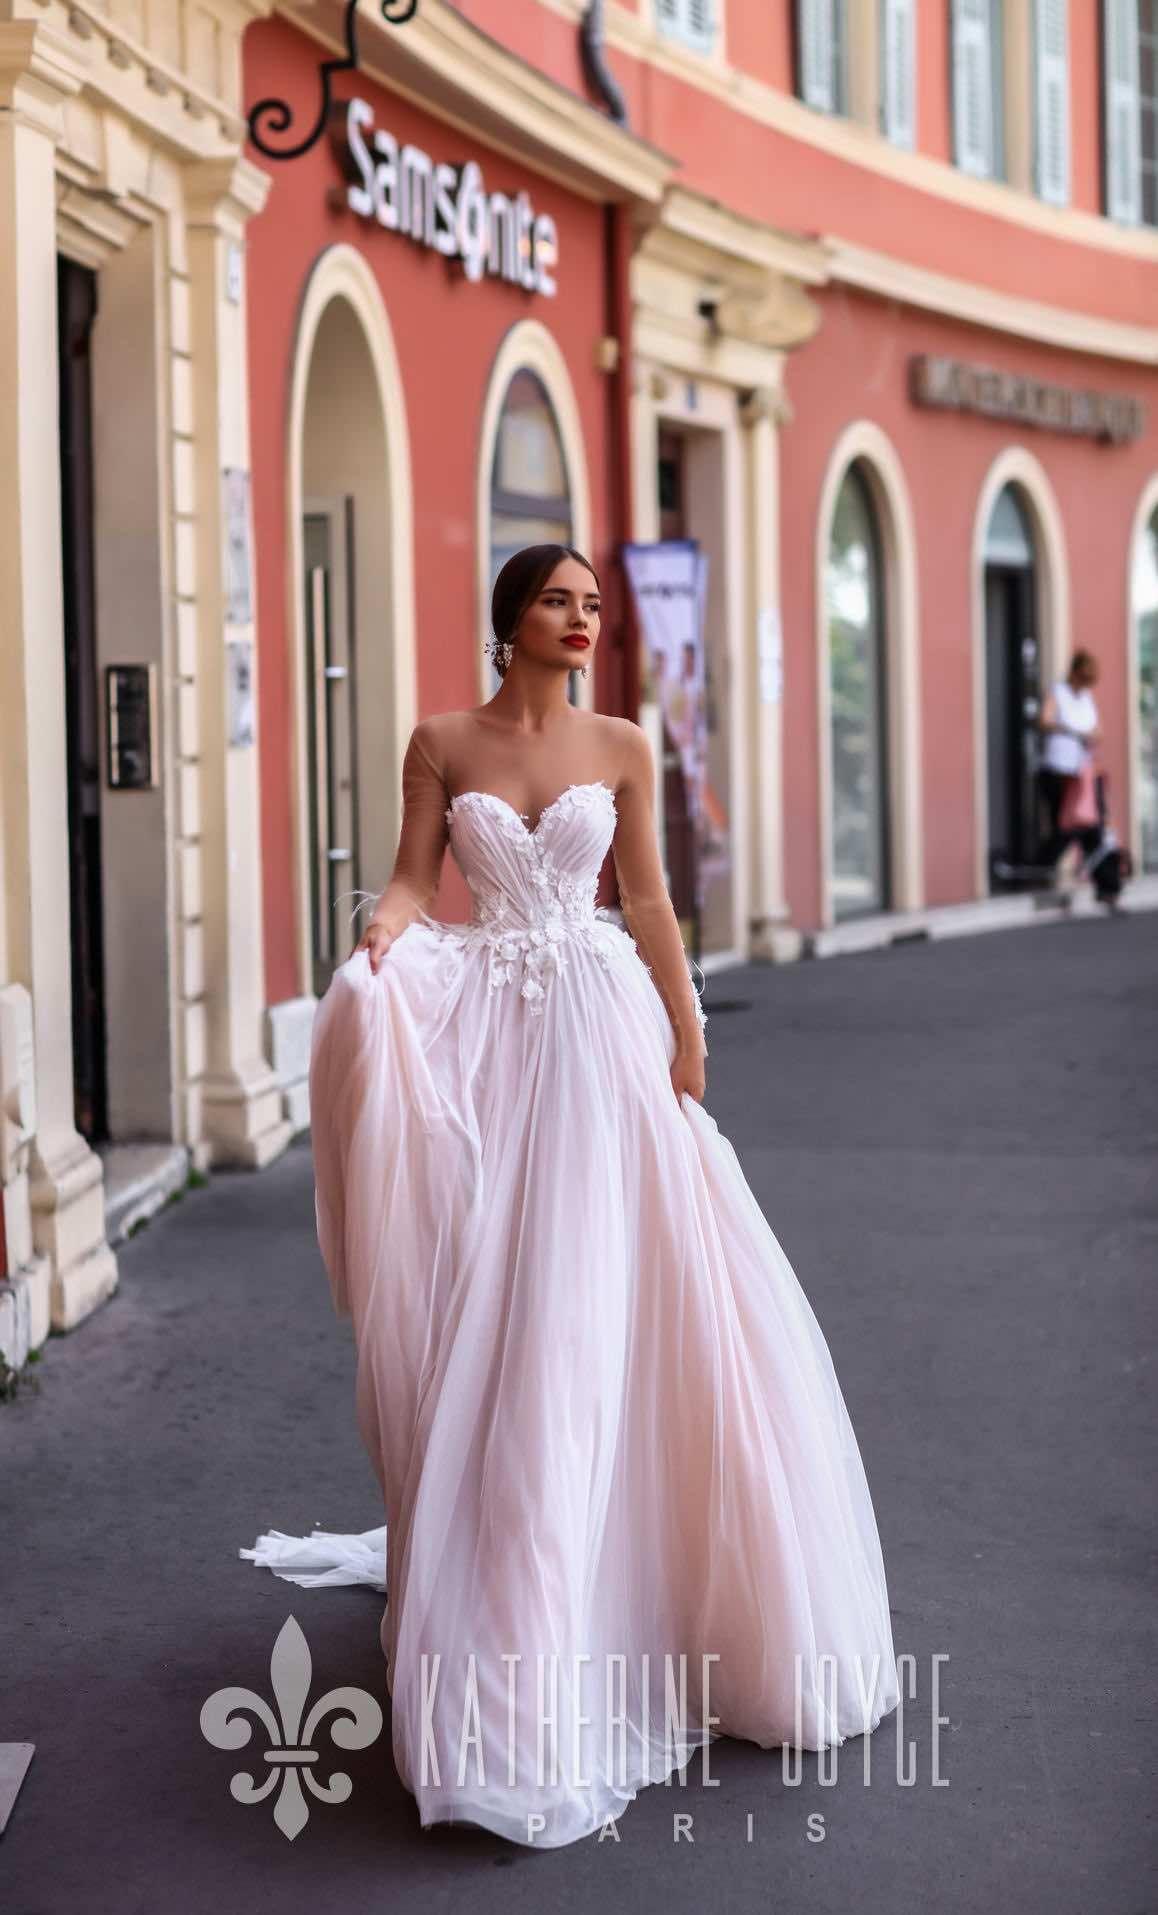 Romantic katherine joyce wedding dresses with modern elegance